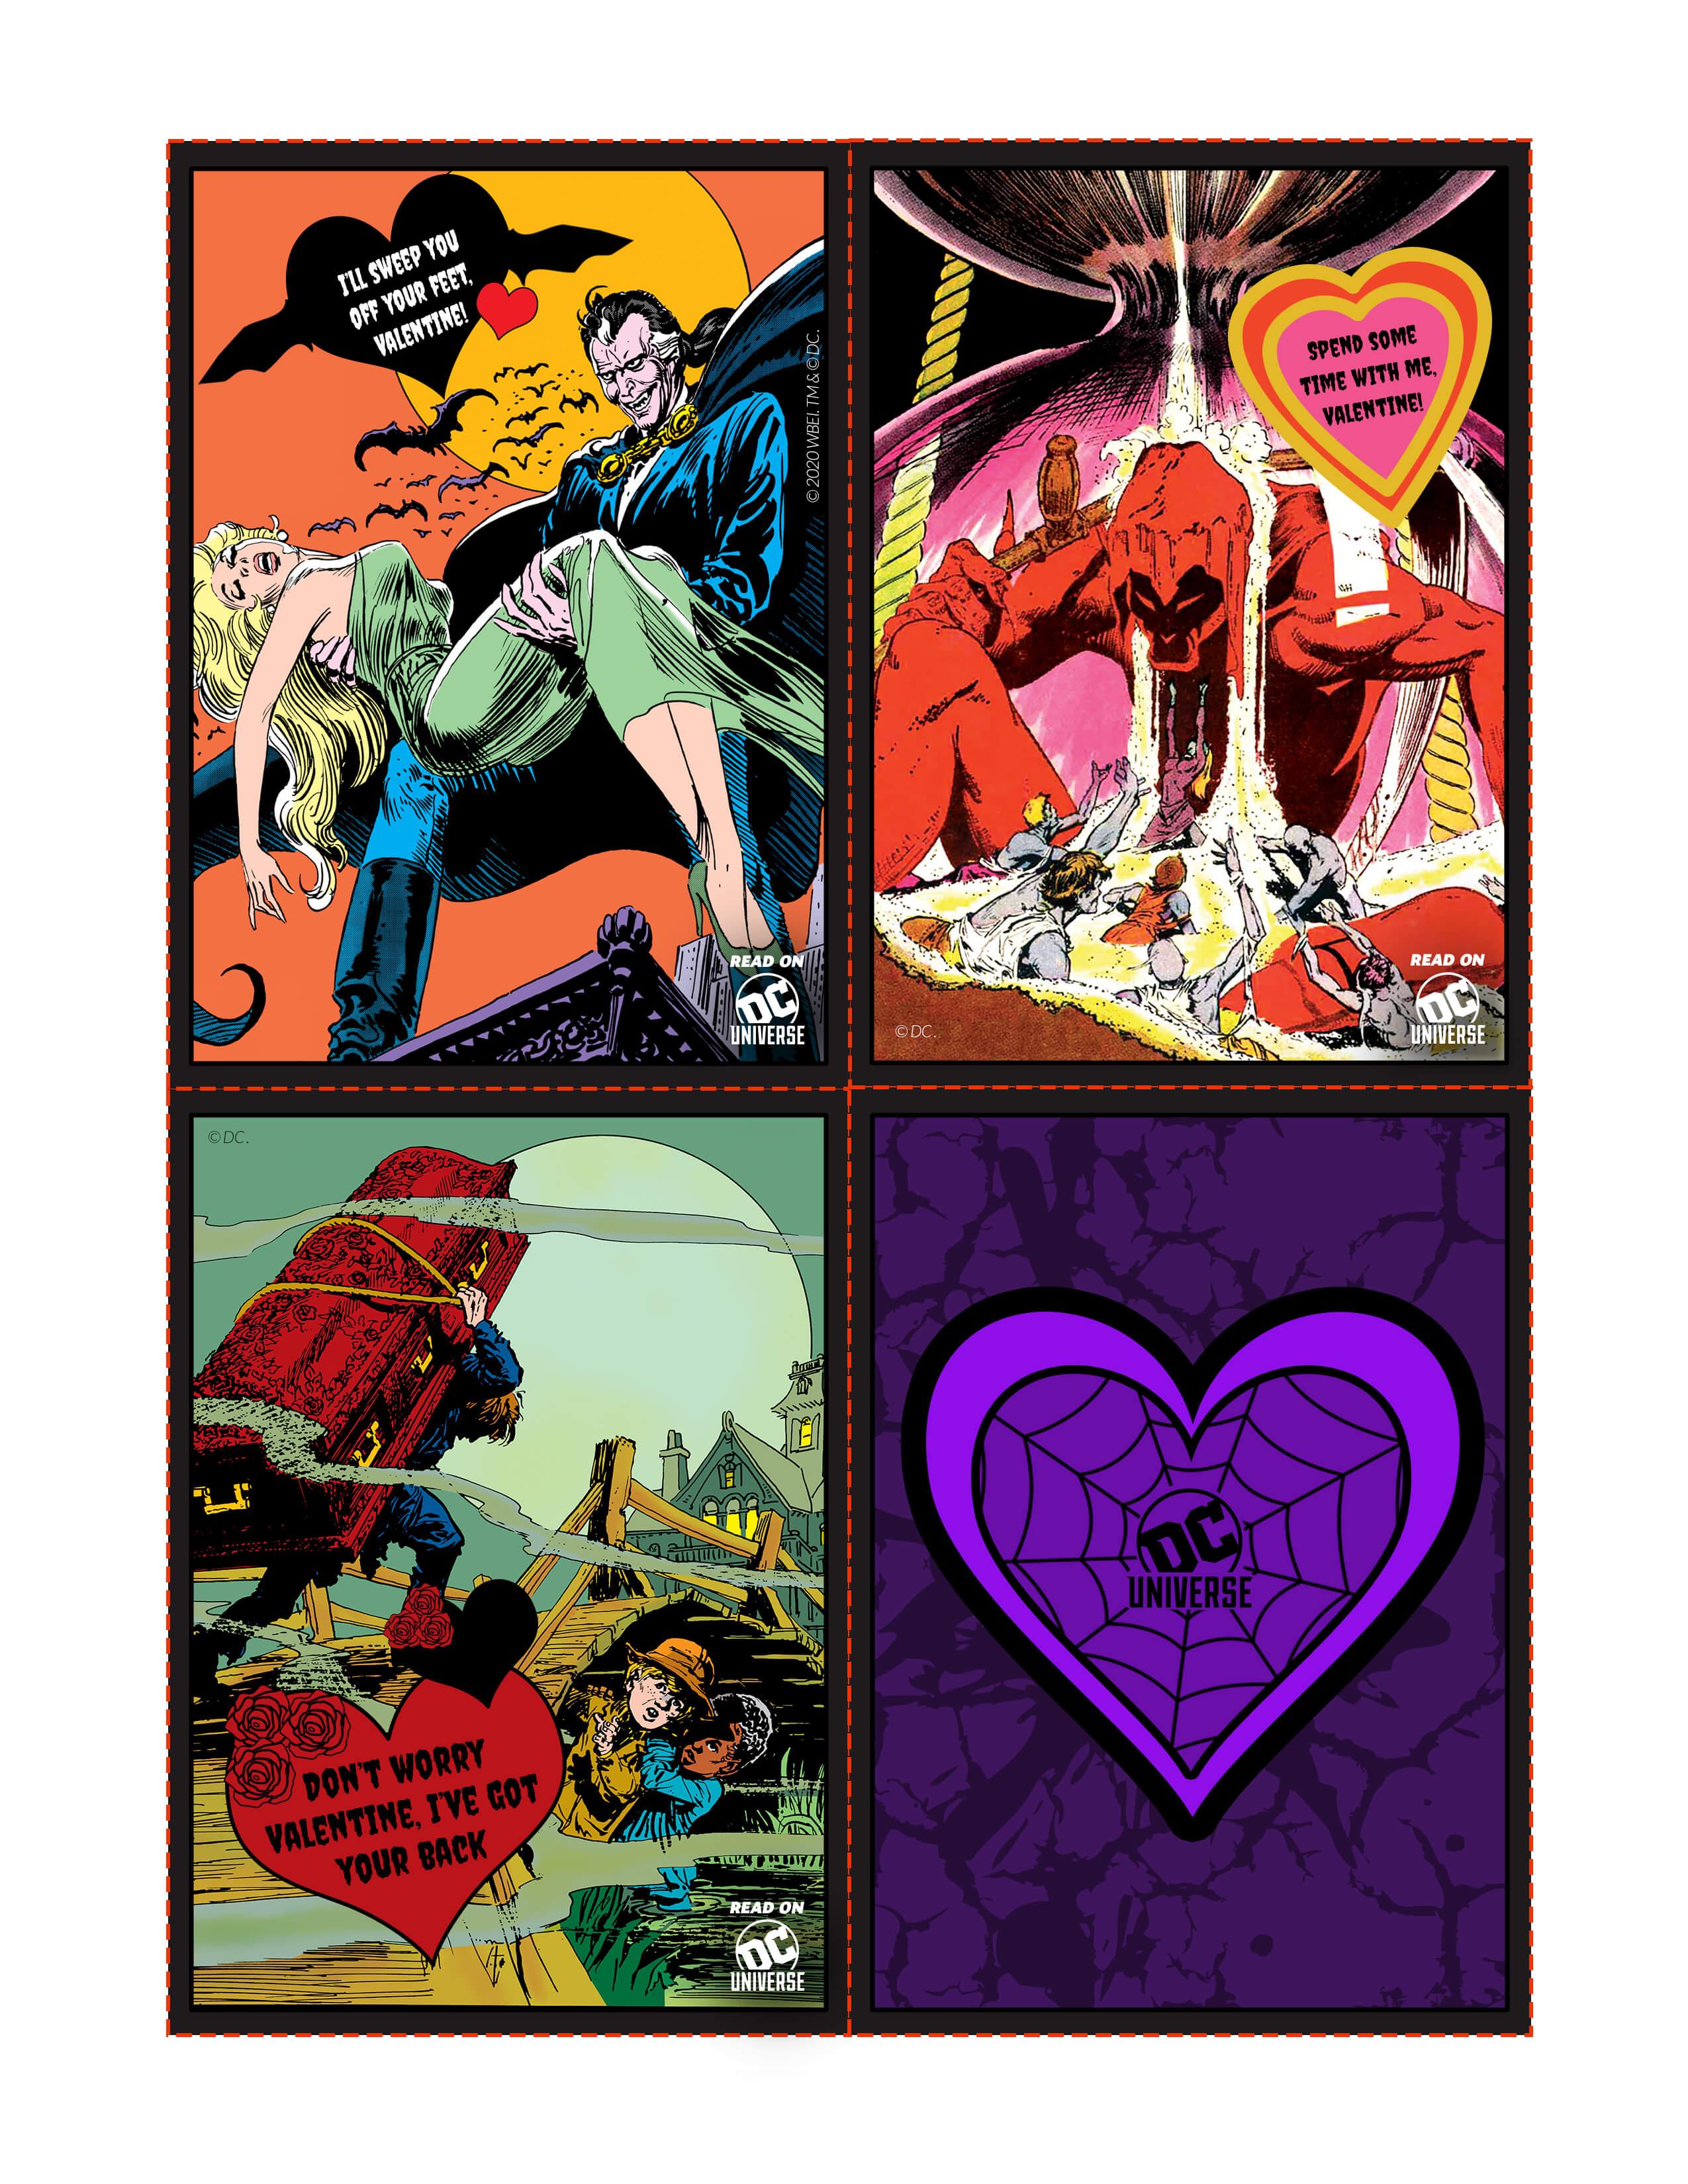 Spooky Valentines Day3-2.jpg